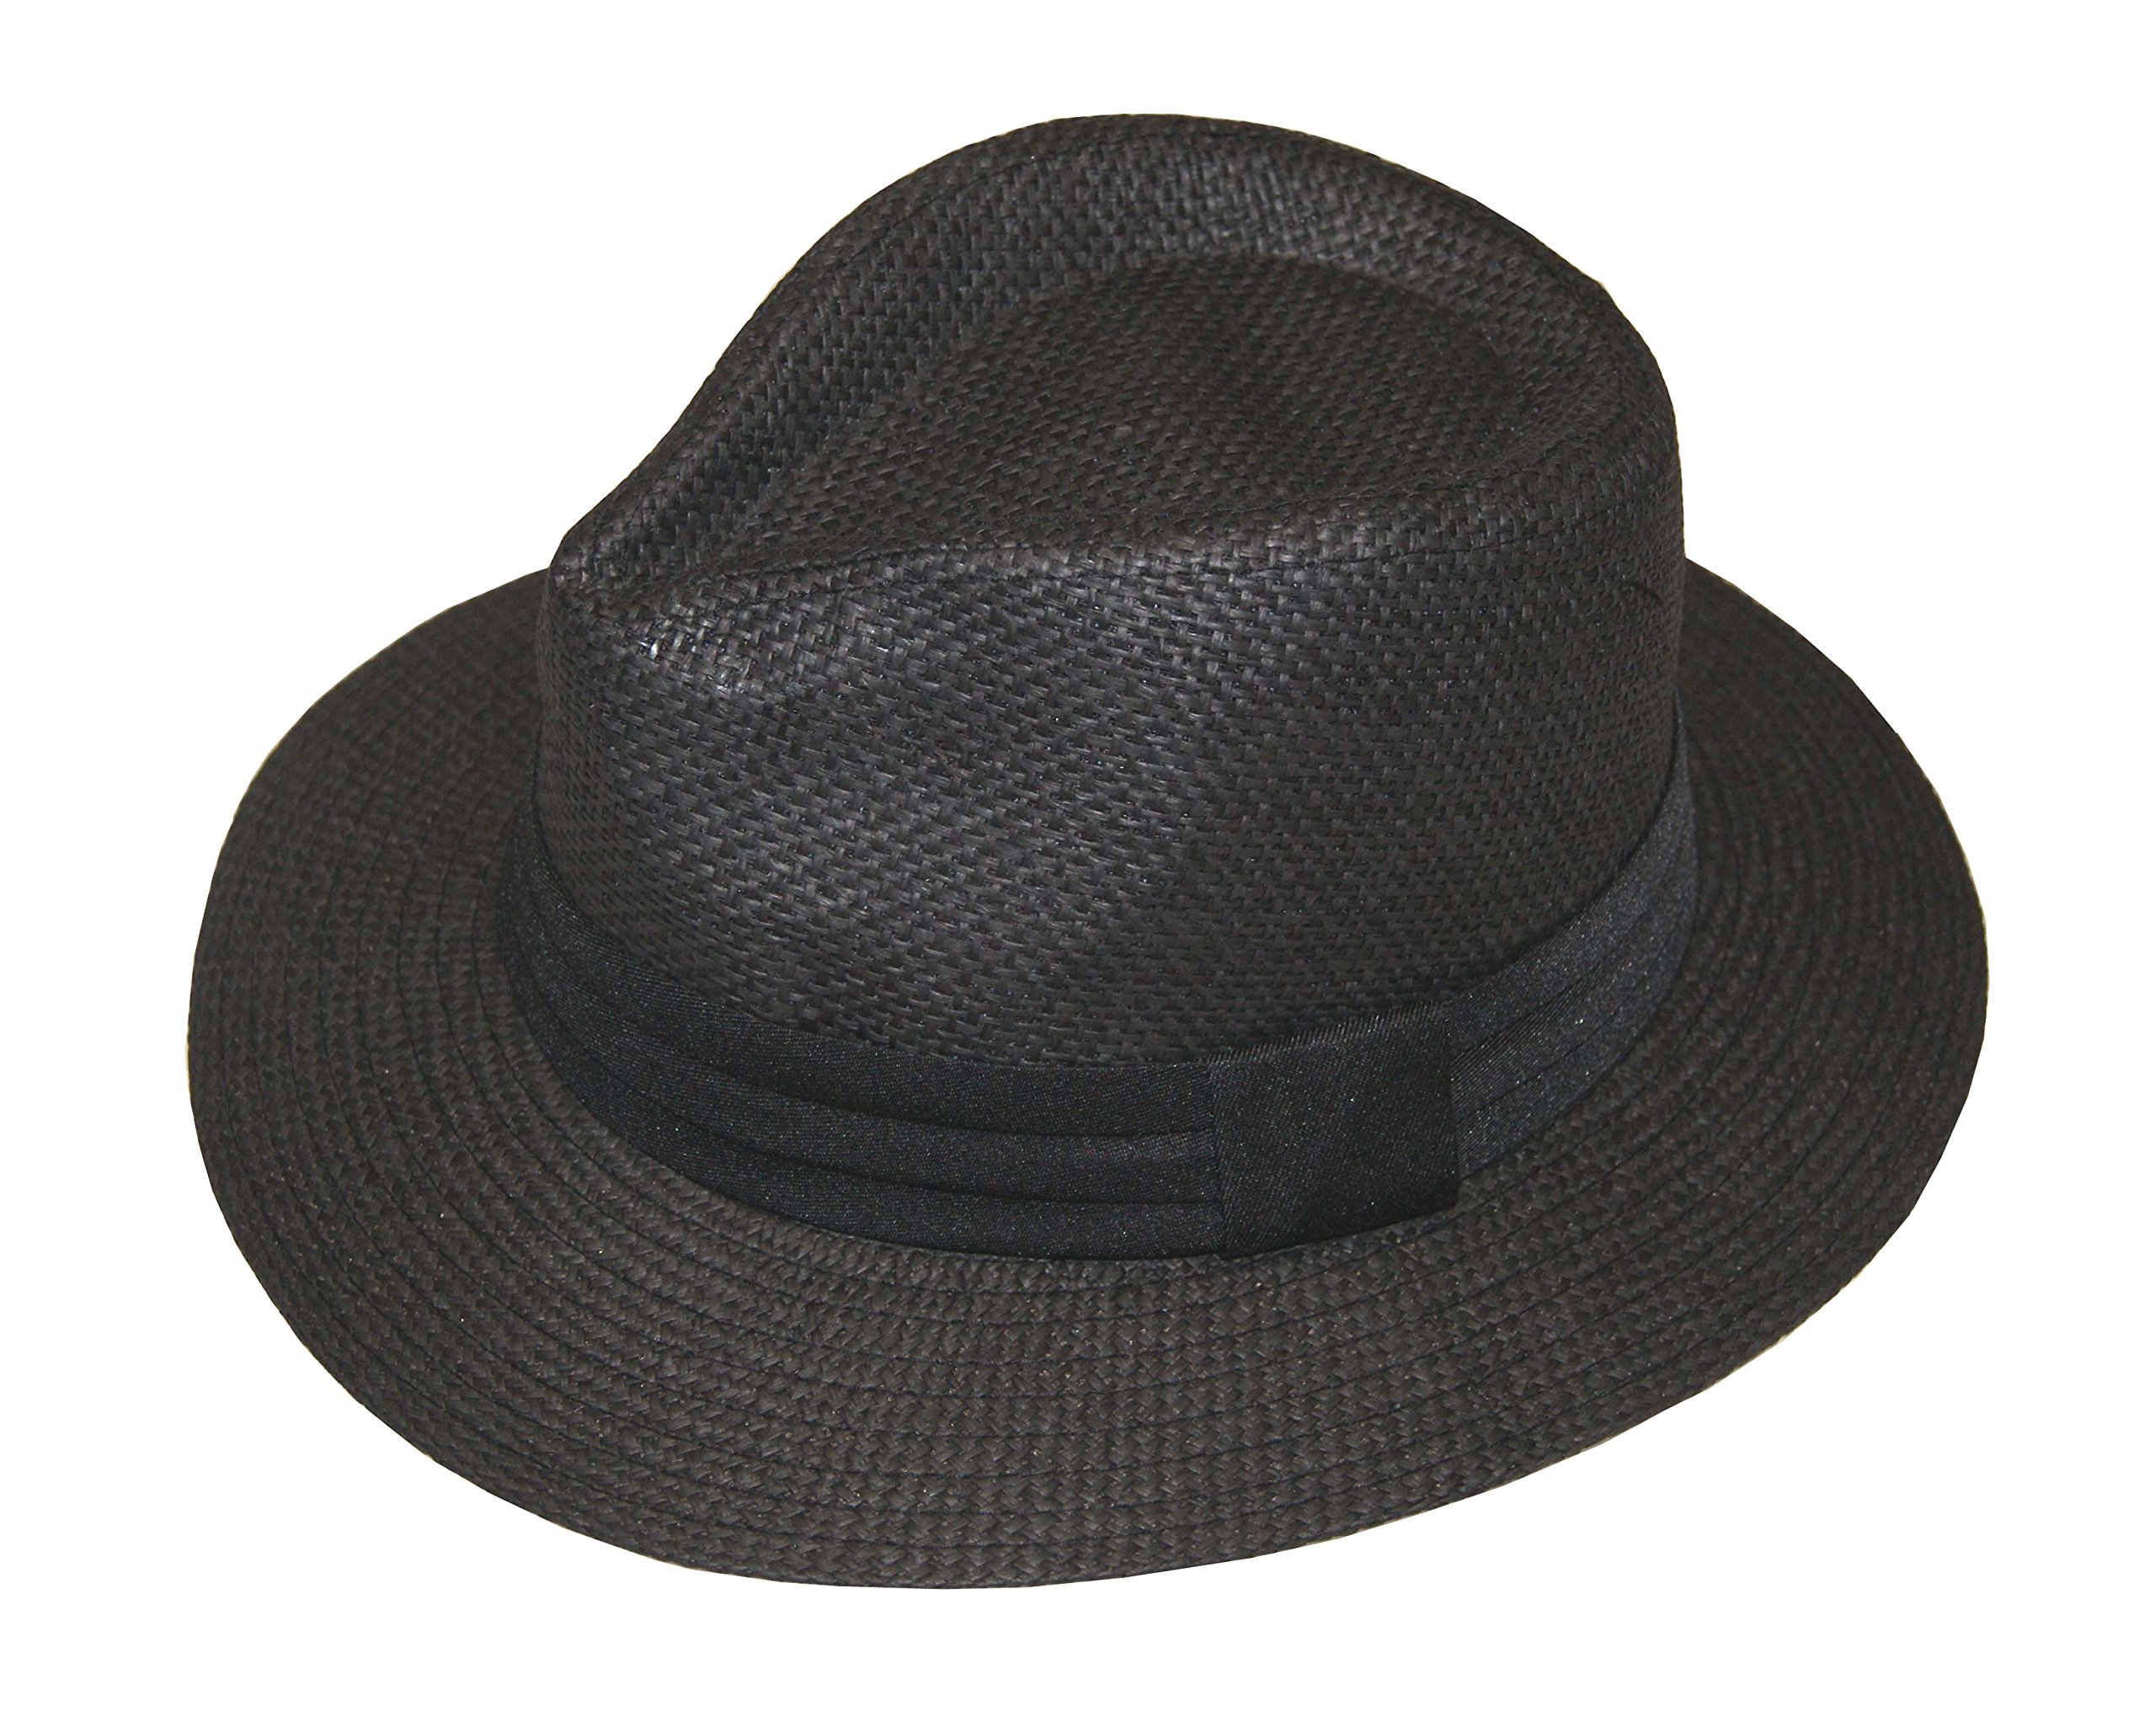 Fashion Man Summer Golf Sun Hat Panama Cap - Brand New (Black, 58cm) by Tamsmart (Image #1)